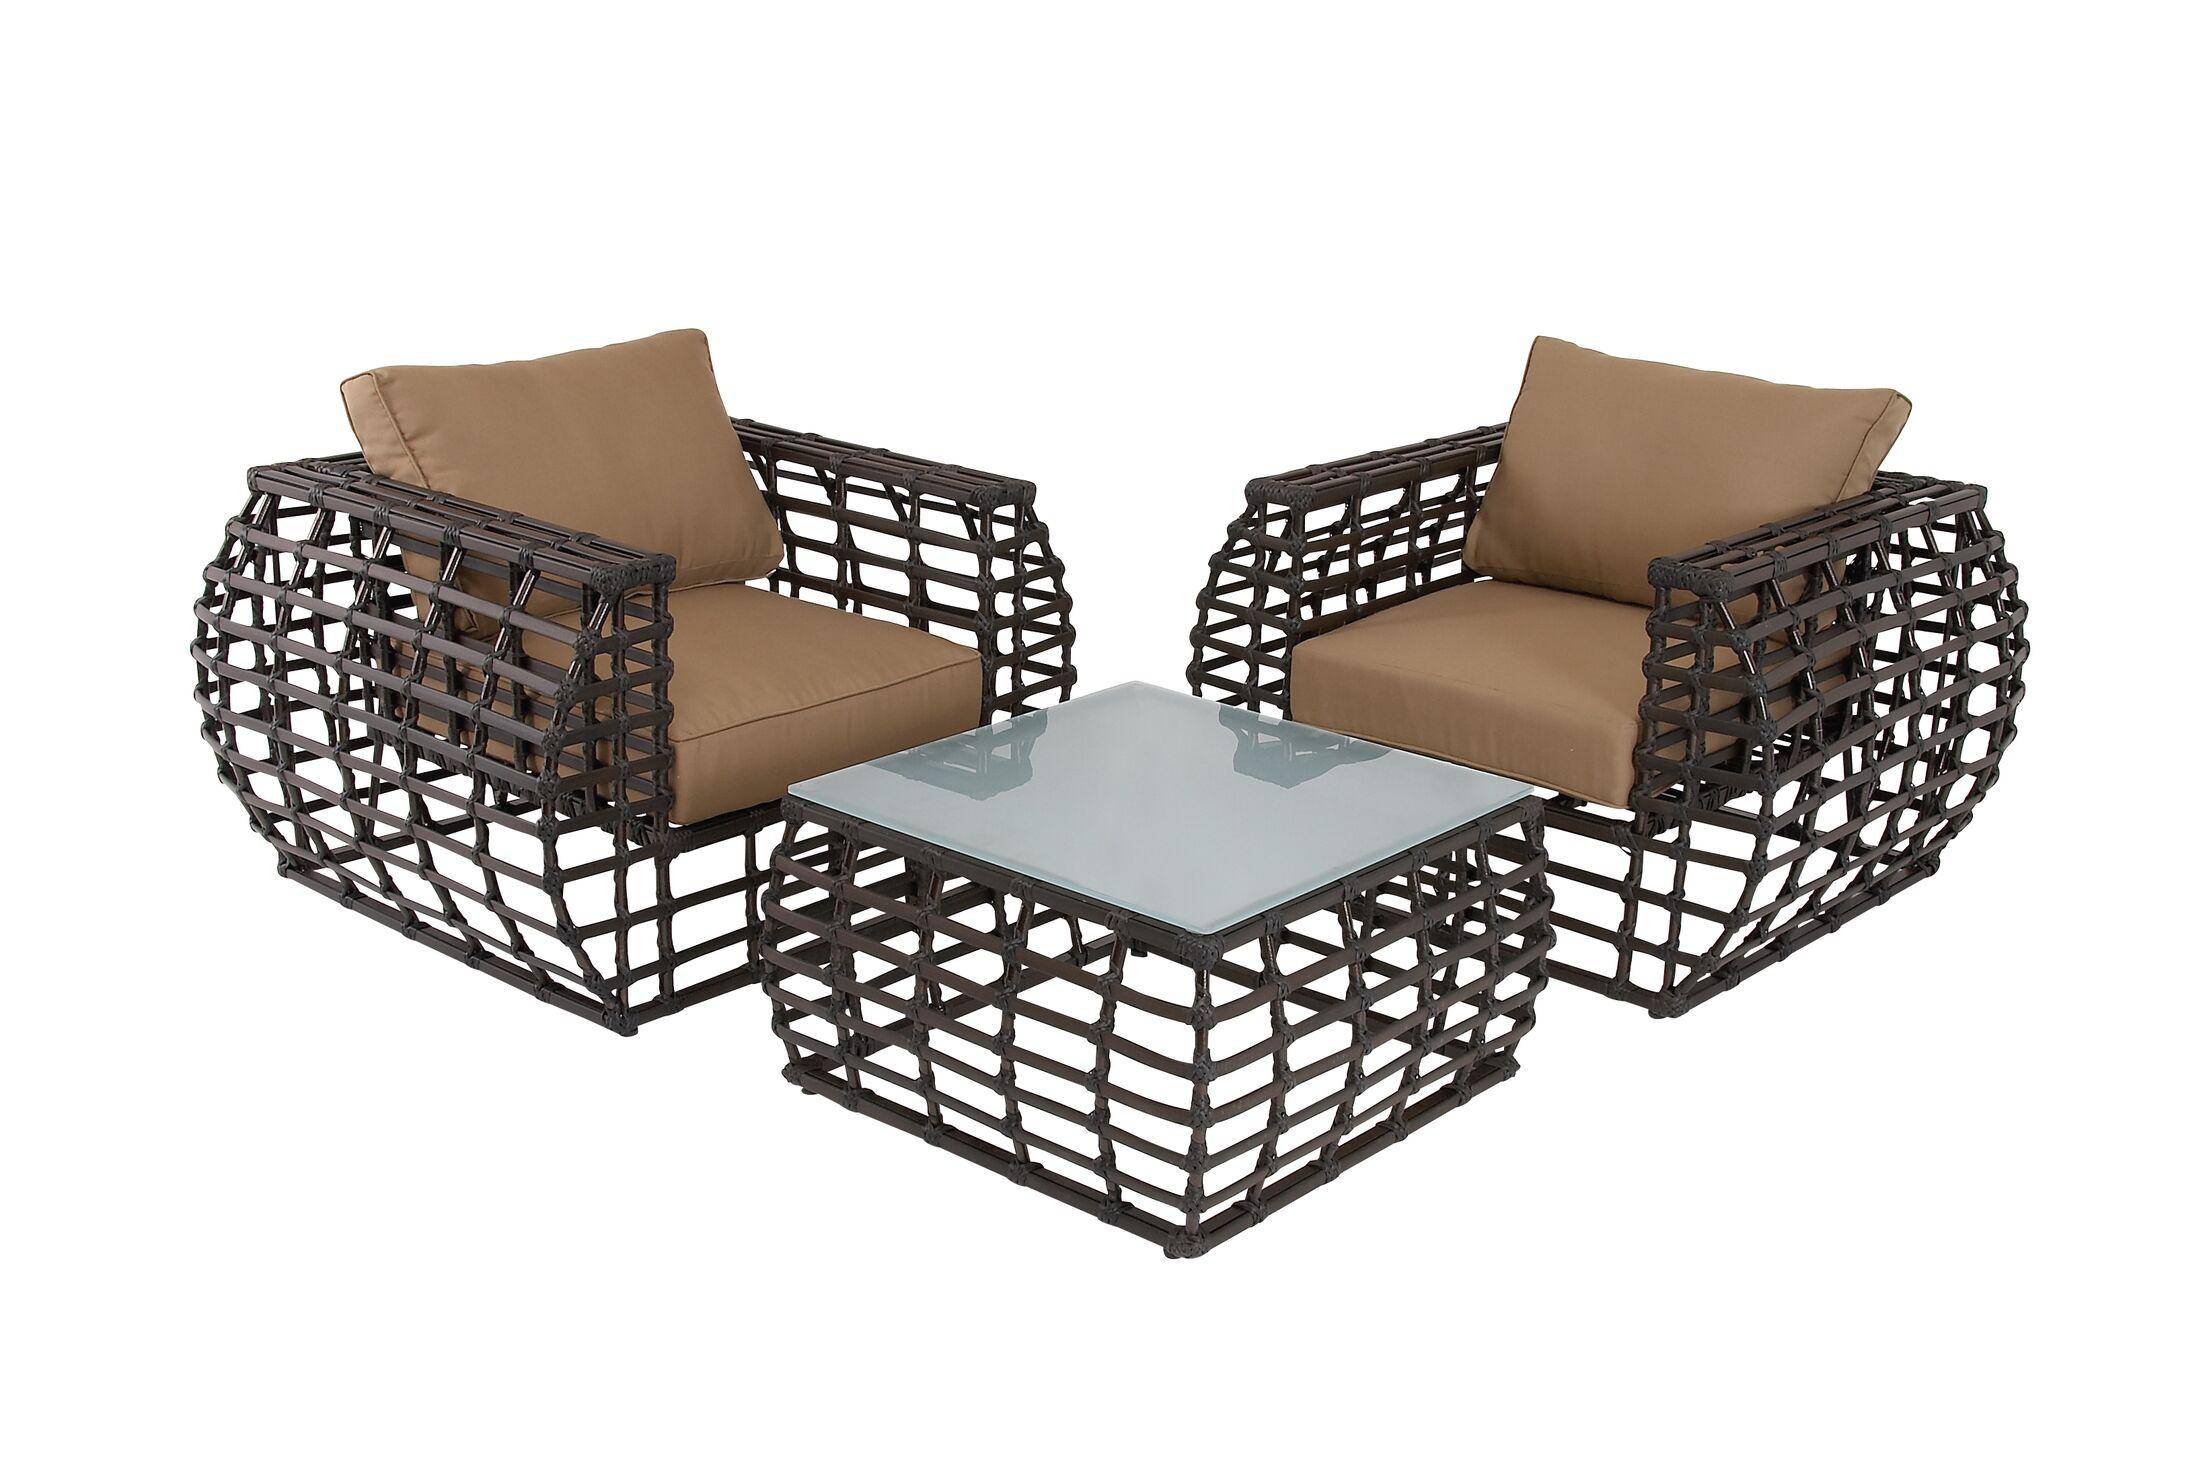 3 Piece Rattan Sofa Set with Cushions